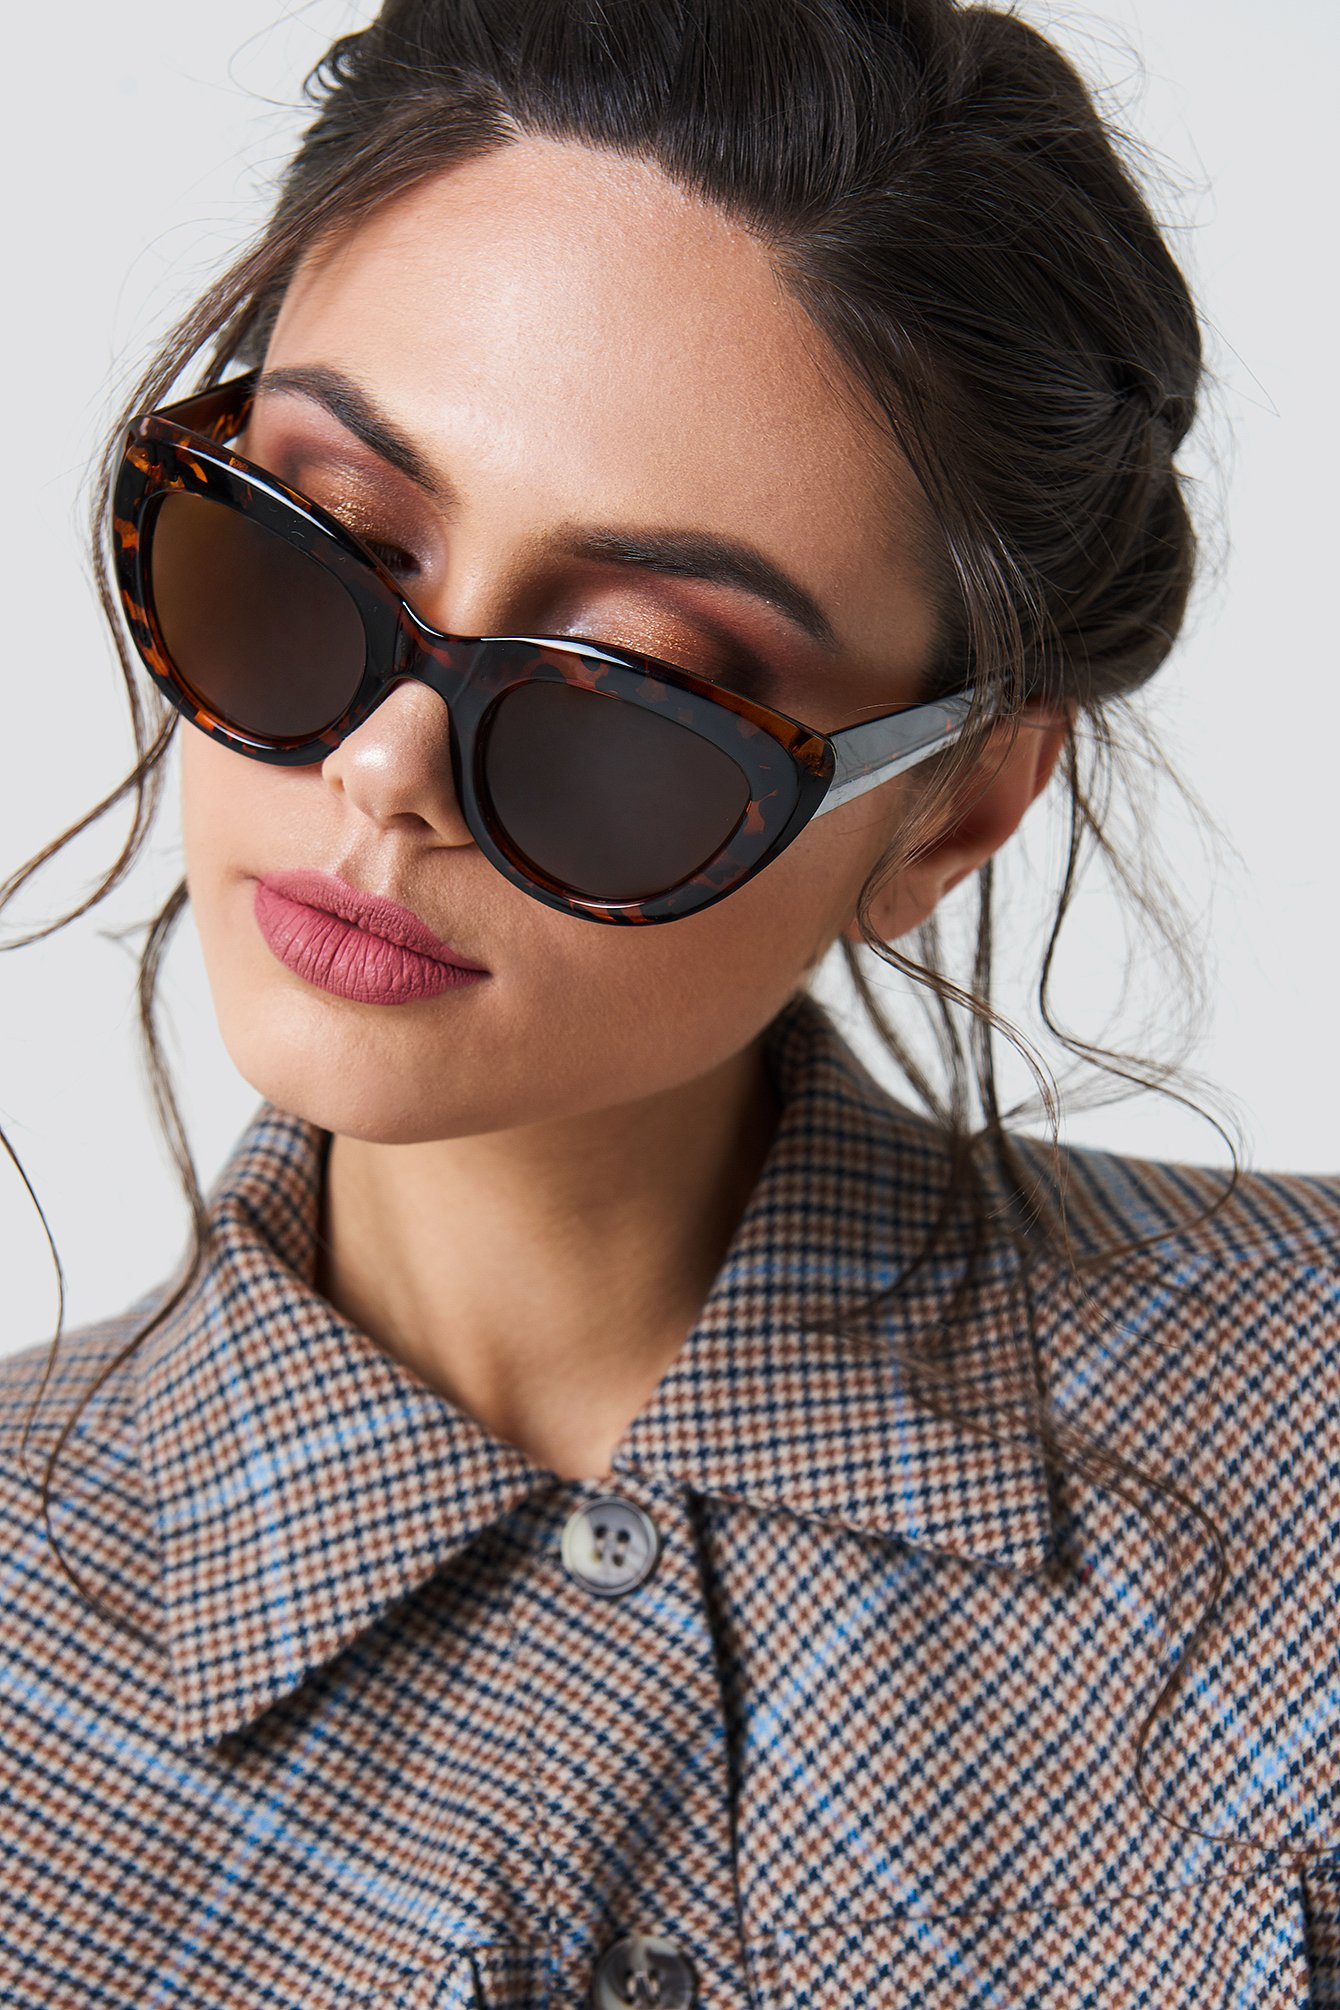 na-kd accessories -  Cat Eye Sunglasses - Brown,Multicolor